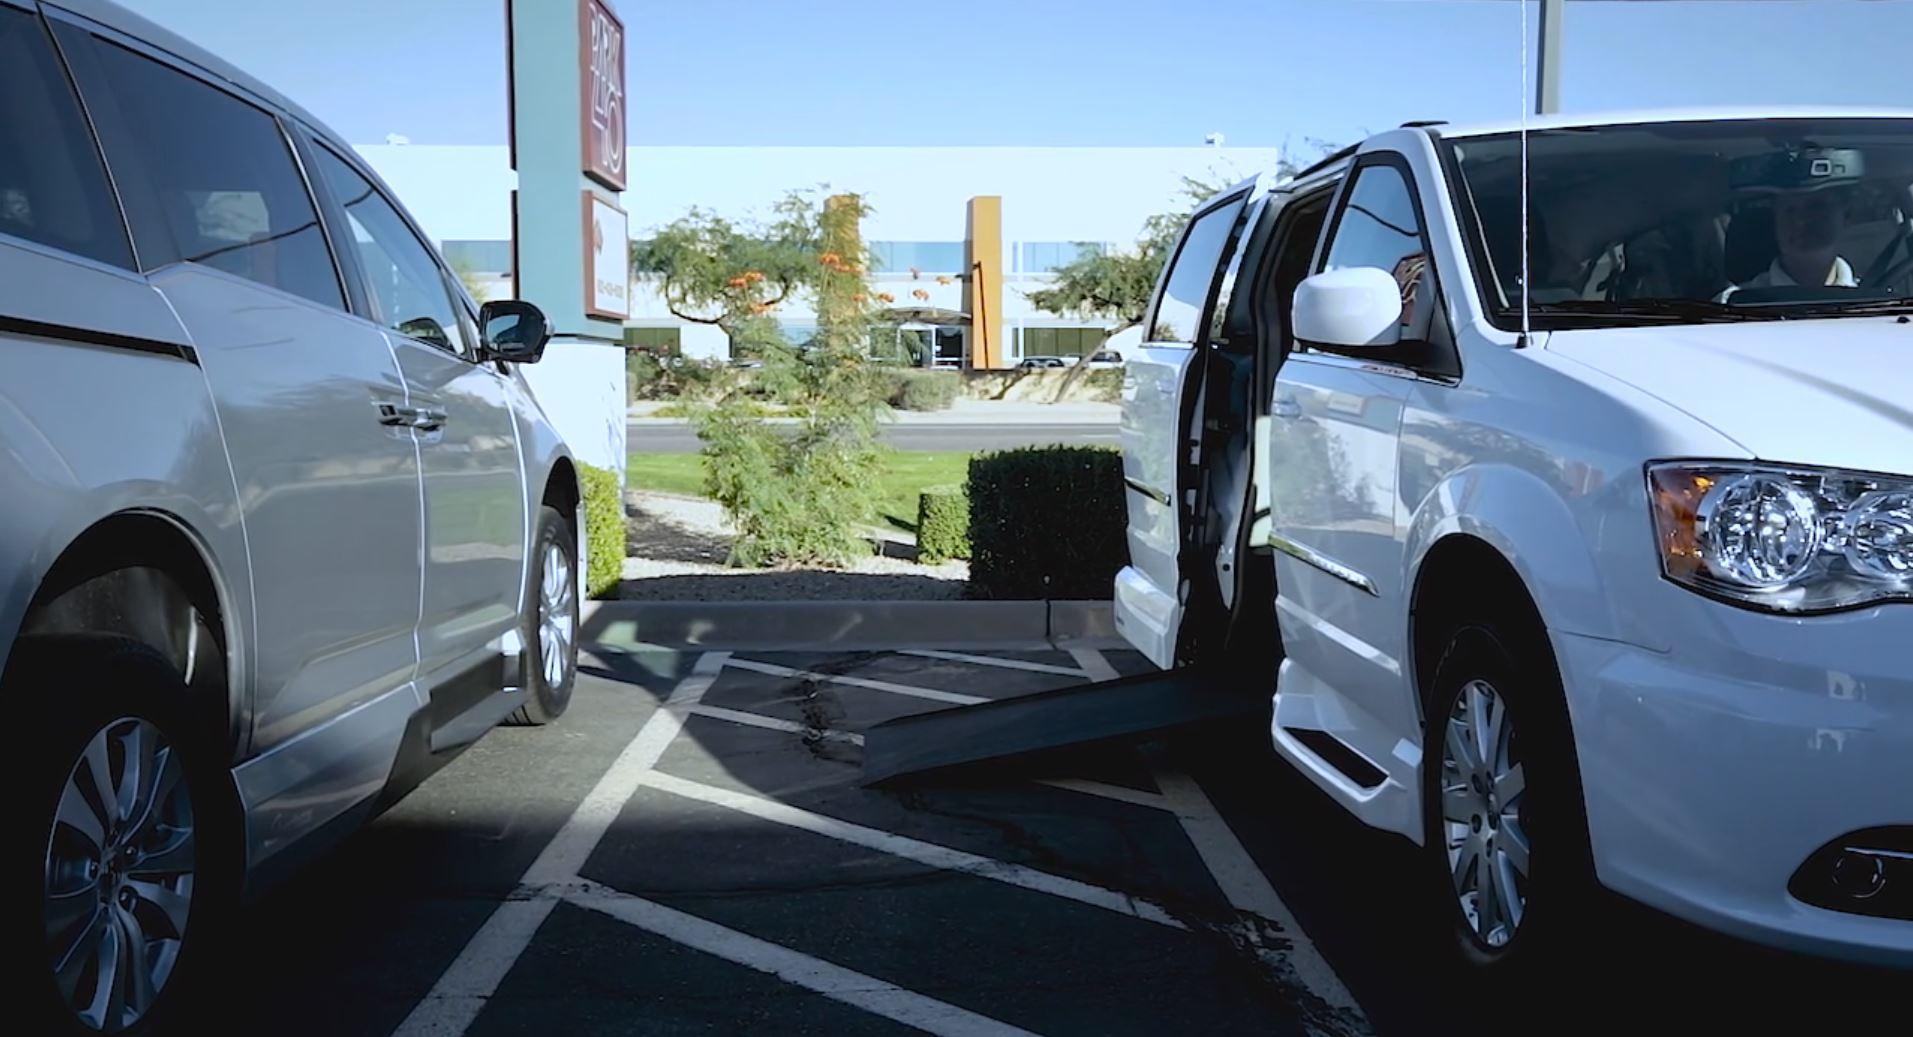 Respecting Wheelchair Van Parking Spaces